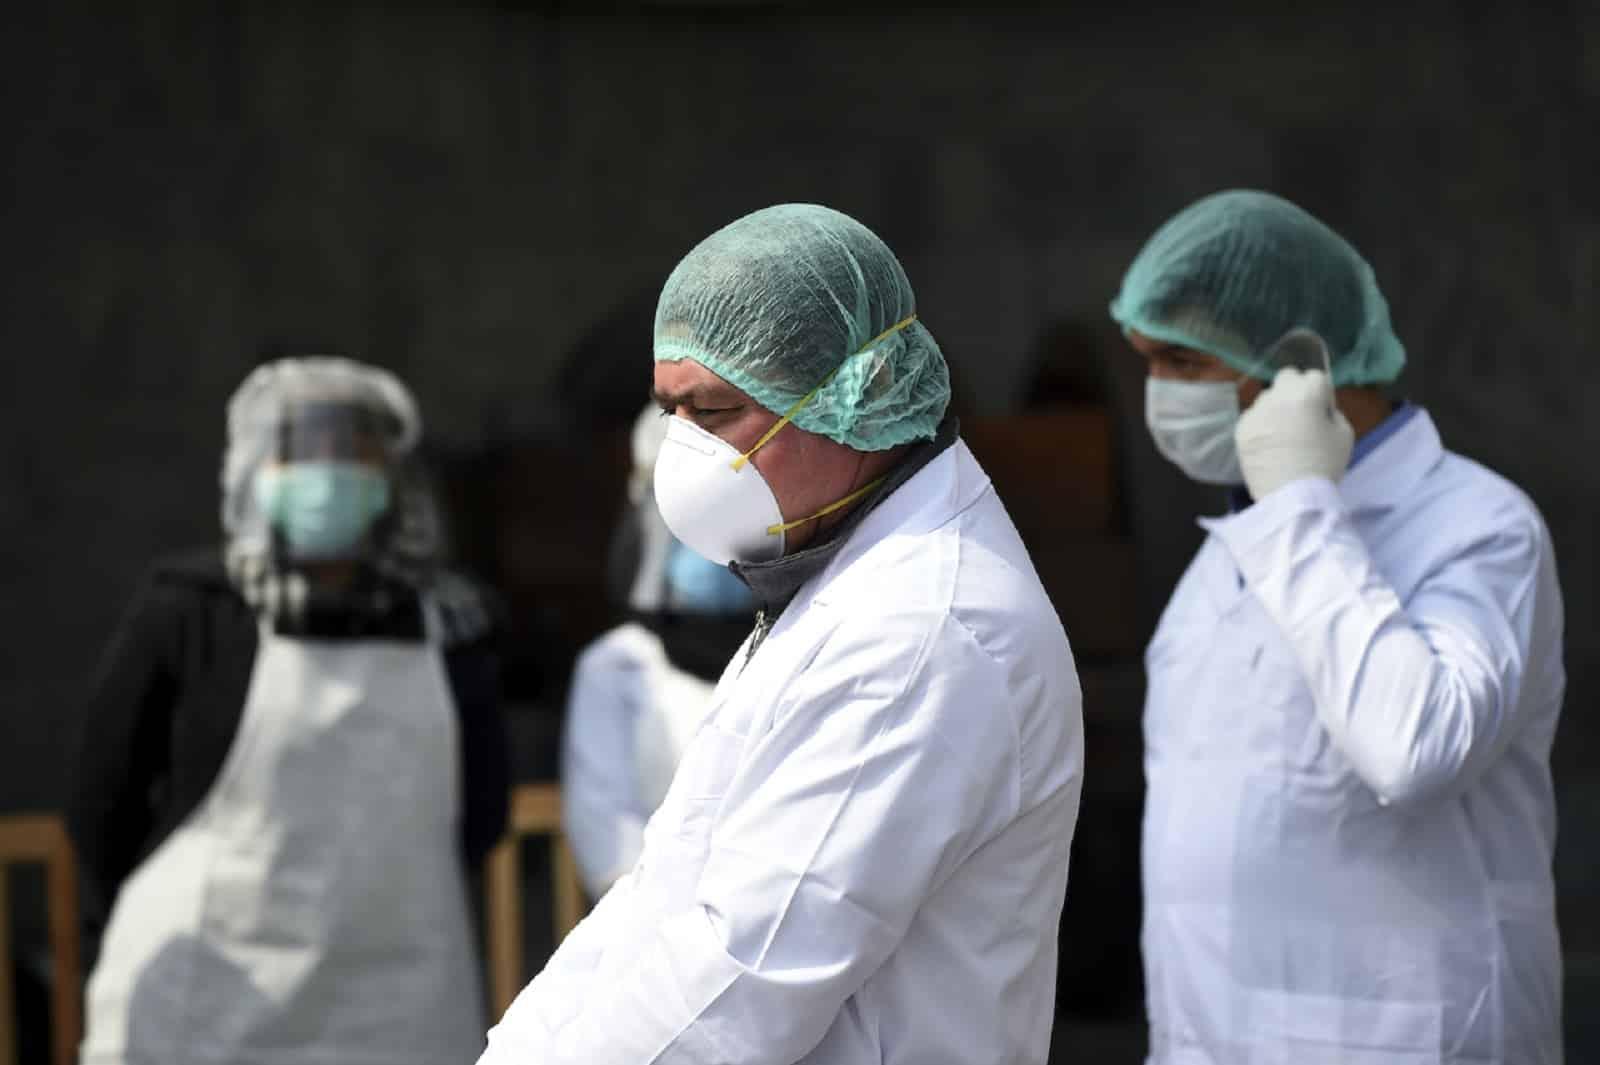 Denuncian que han fallecido 14 médicos por Covid-19 en dos días en Venezuela